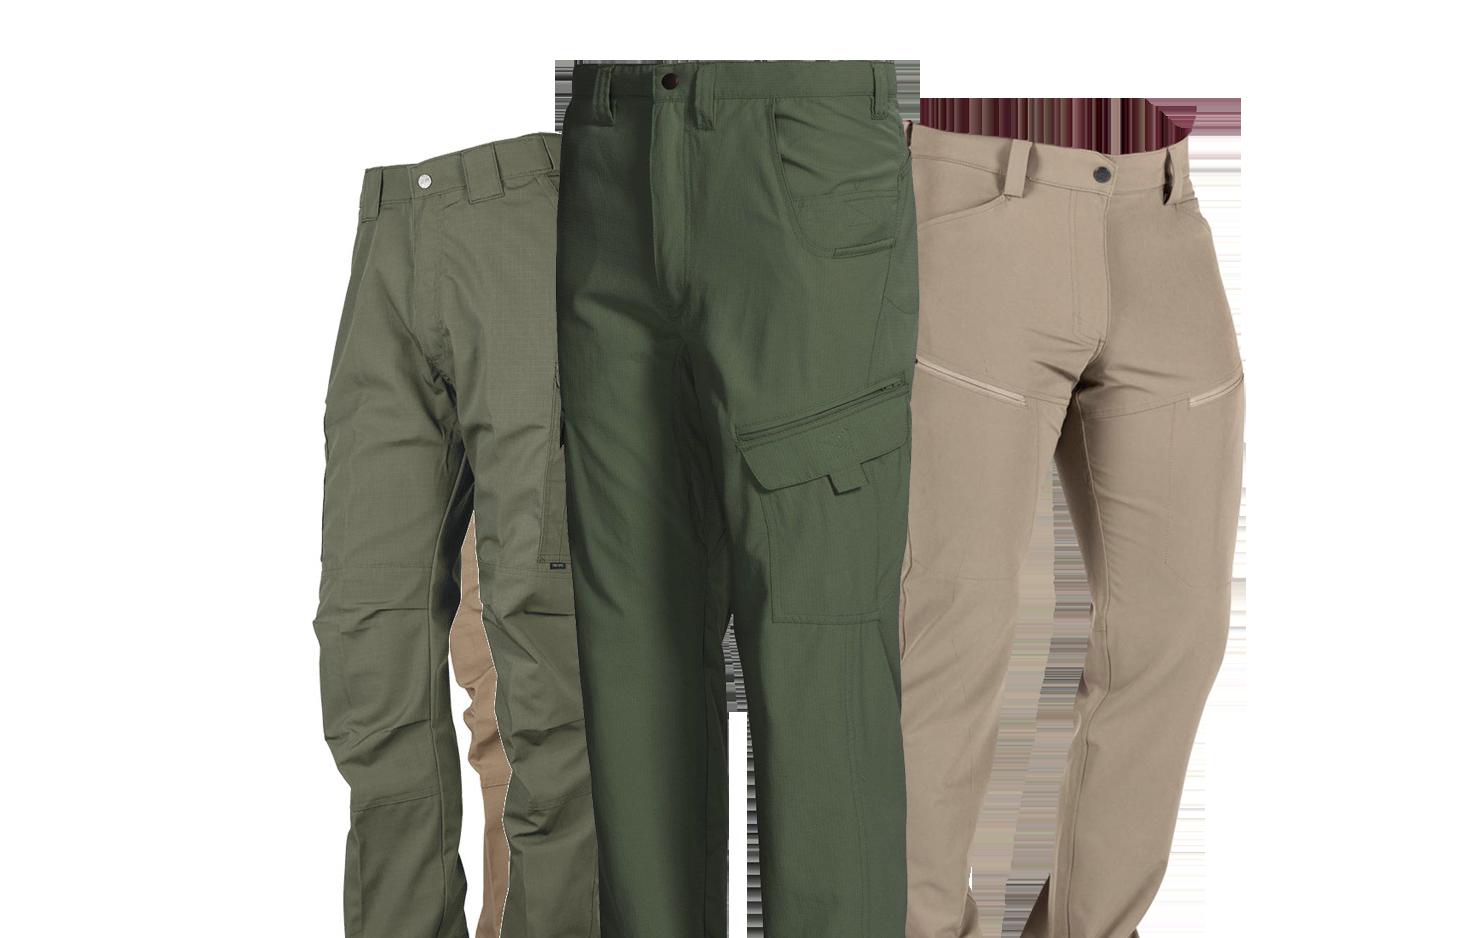 slim fit tactical pants at bereli